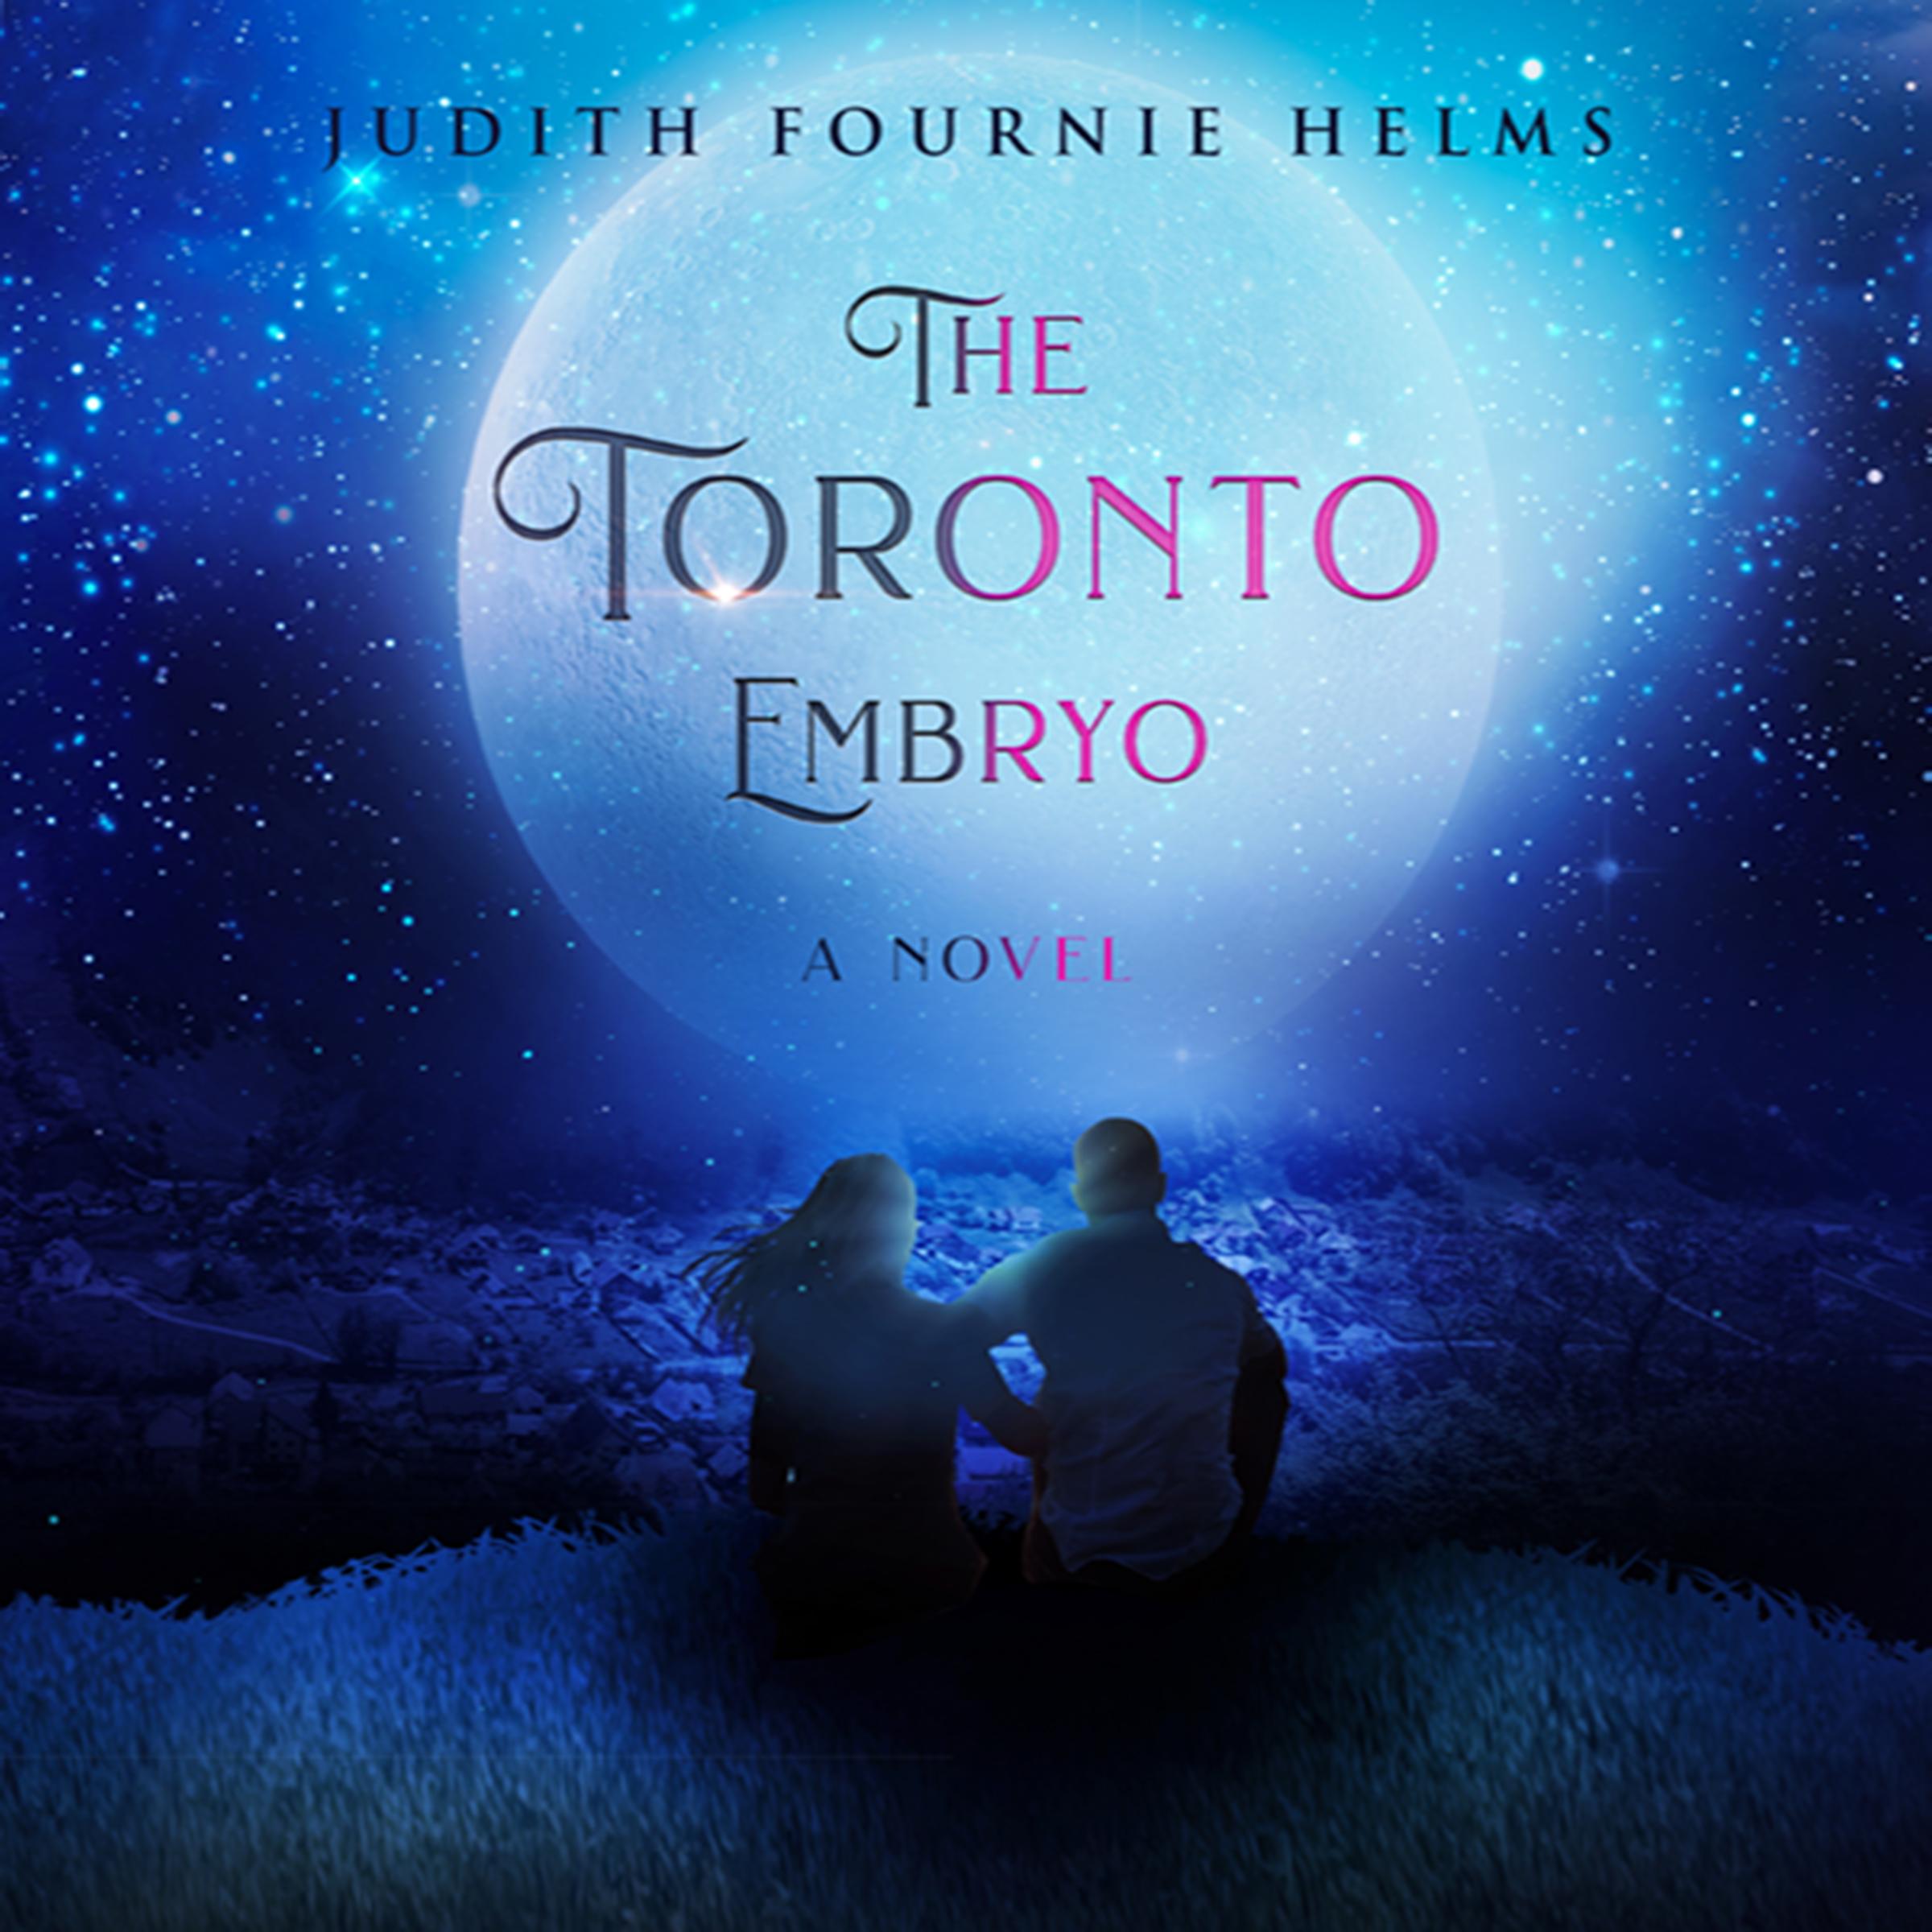 The Toronto Embryo cover image